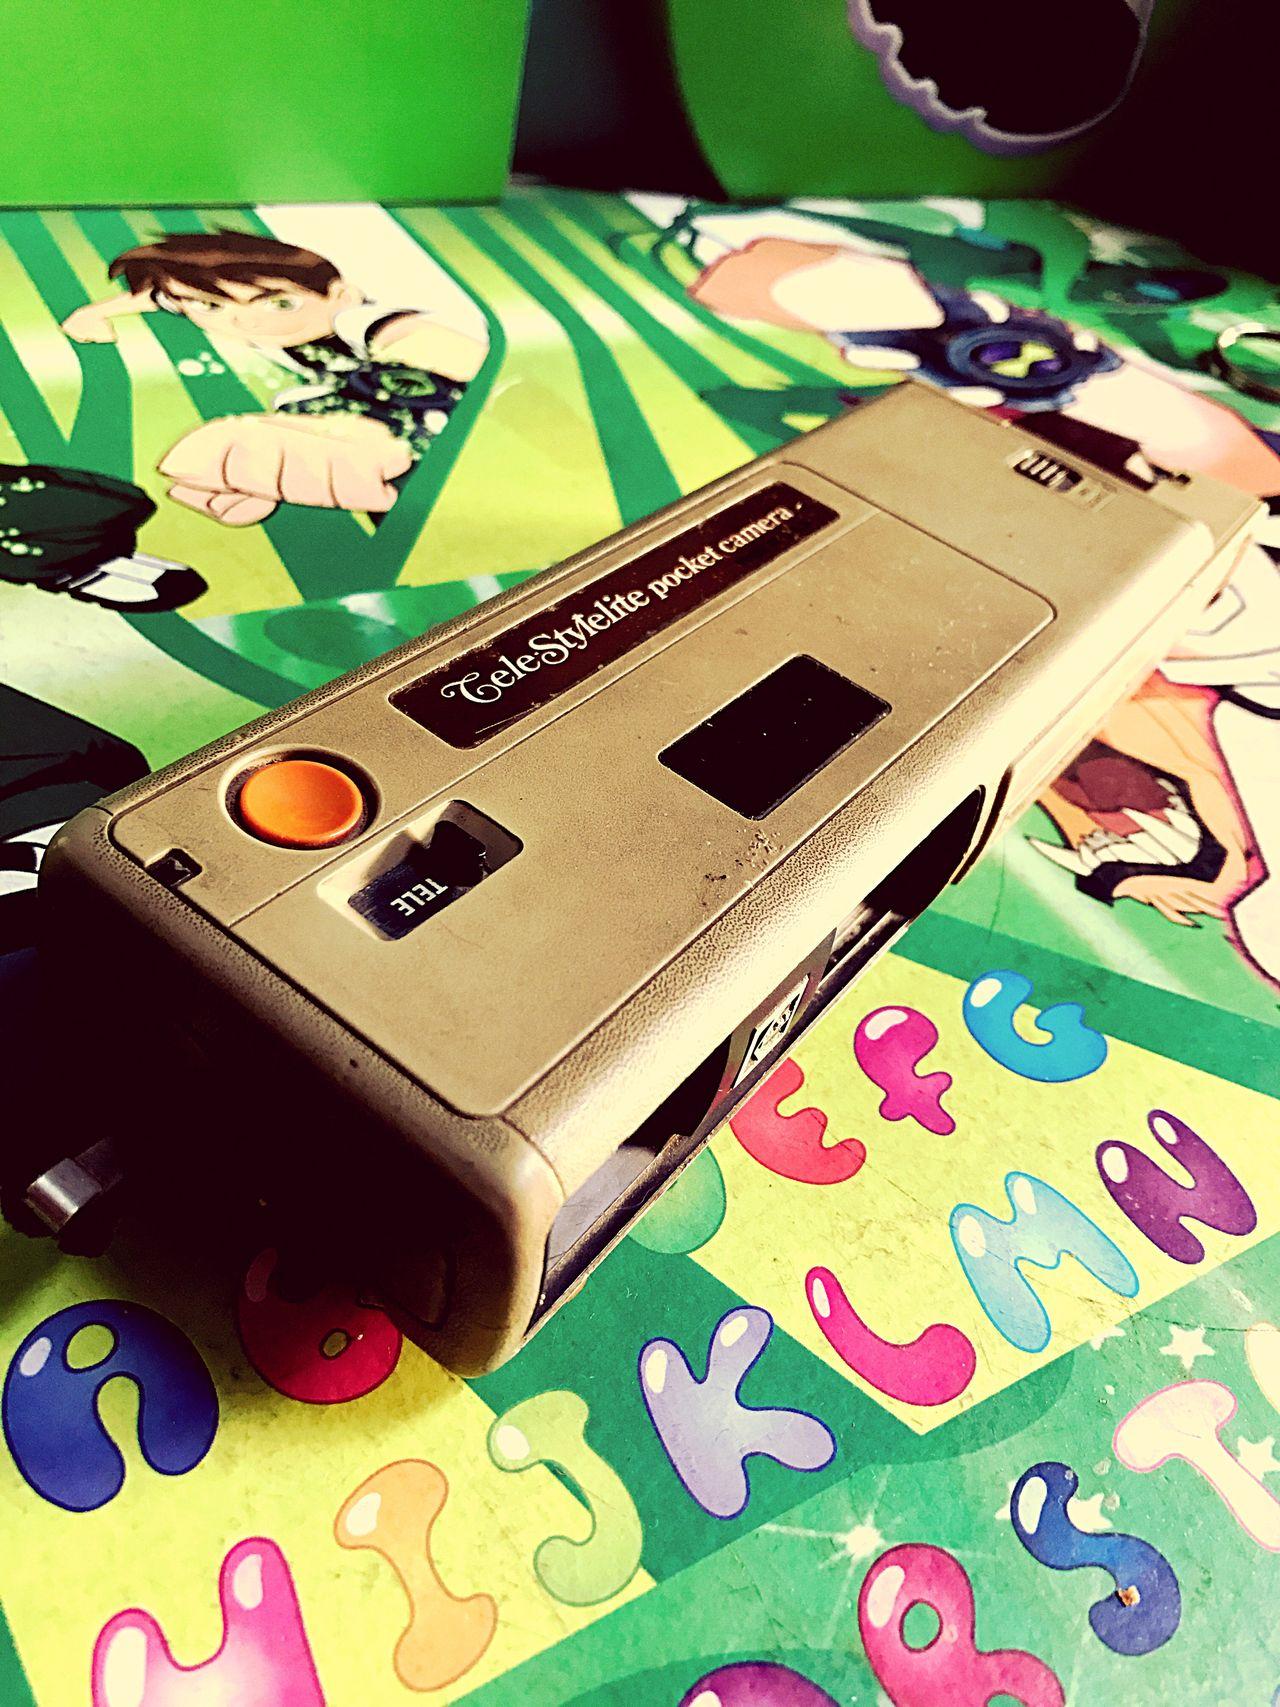 IPhoneography Kodak Vintage Camera Table Technology Gambling Leisure Games Indoors  No People Gambling Chip Like4like EyeemTeam Eyemmarket Close-up